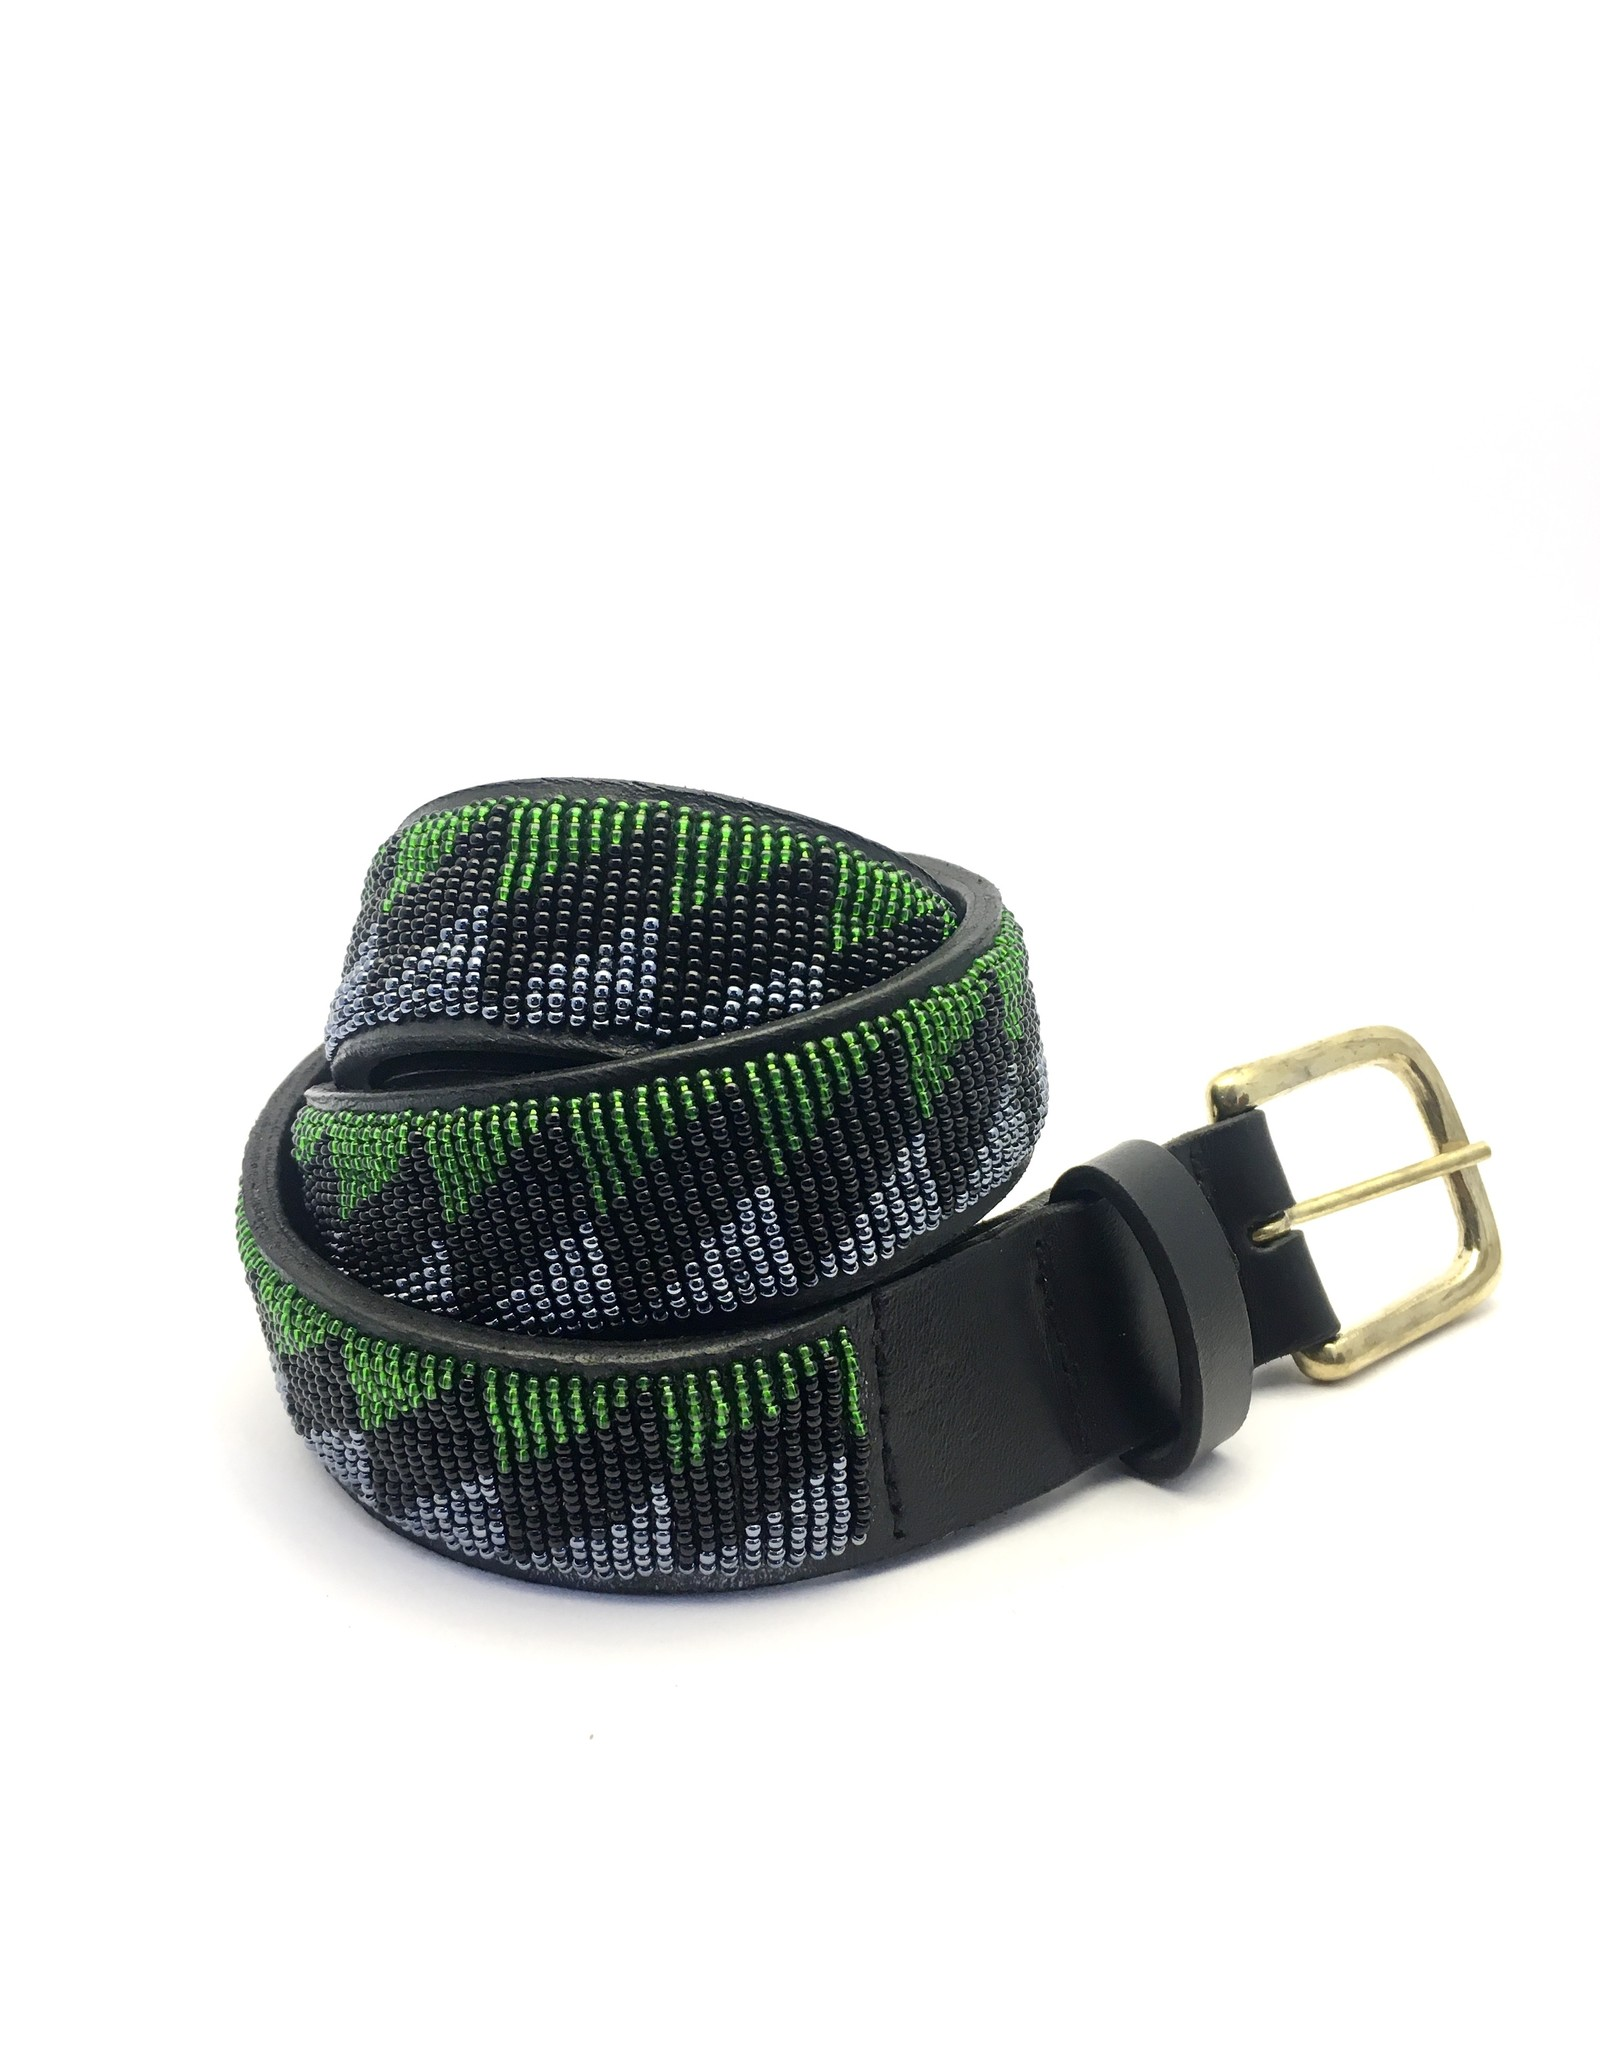 Maisha.Style Belt for Zigizag - black leather Maasai belt with black green and grey beads